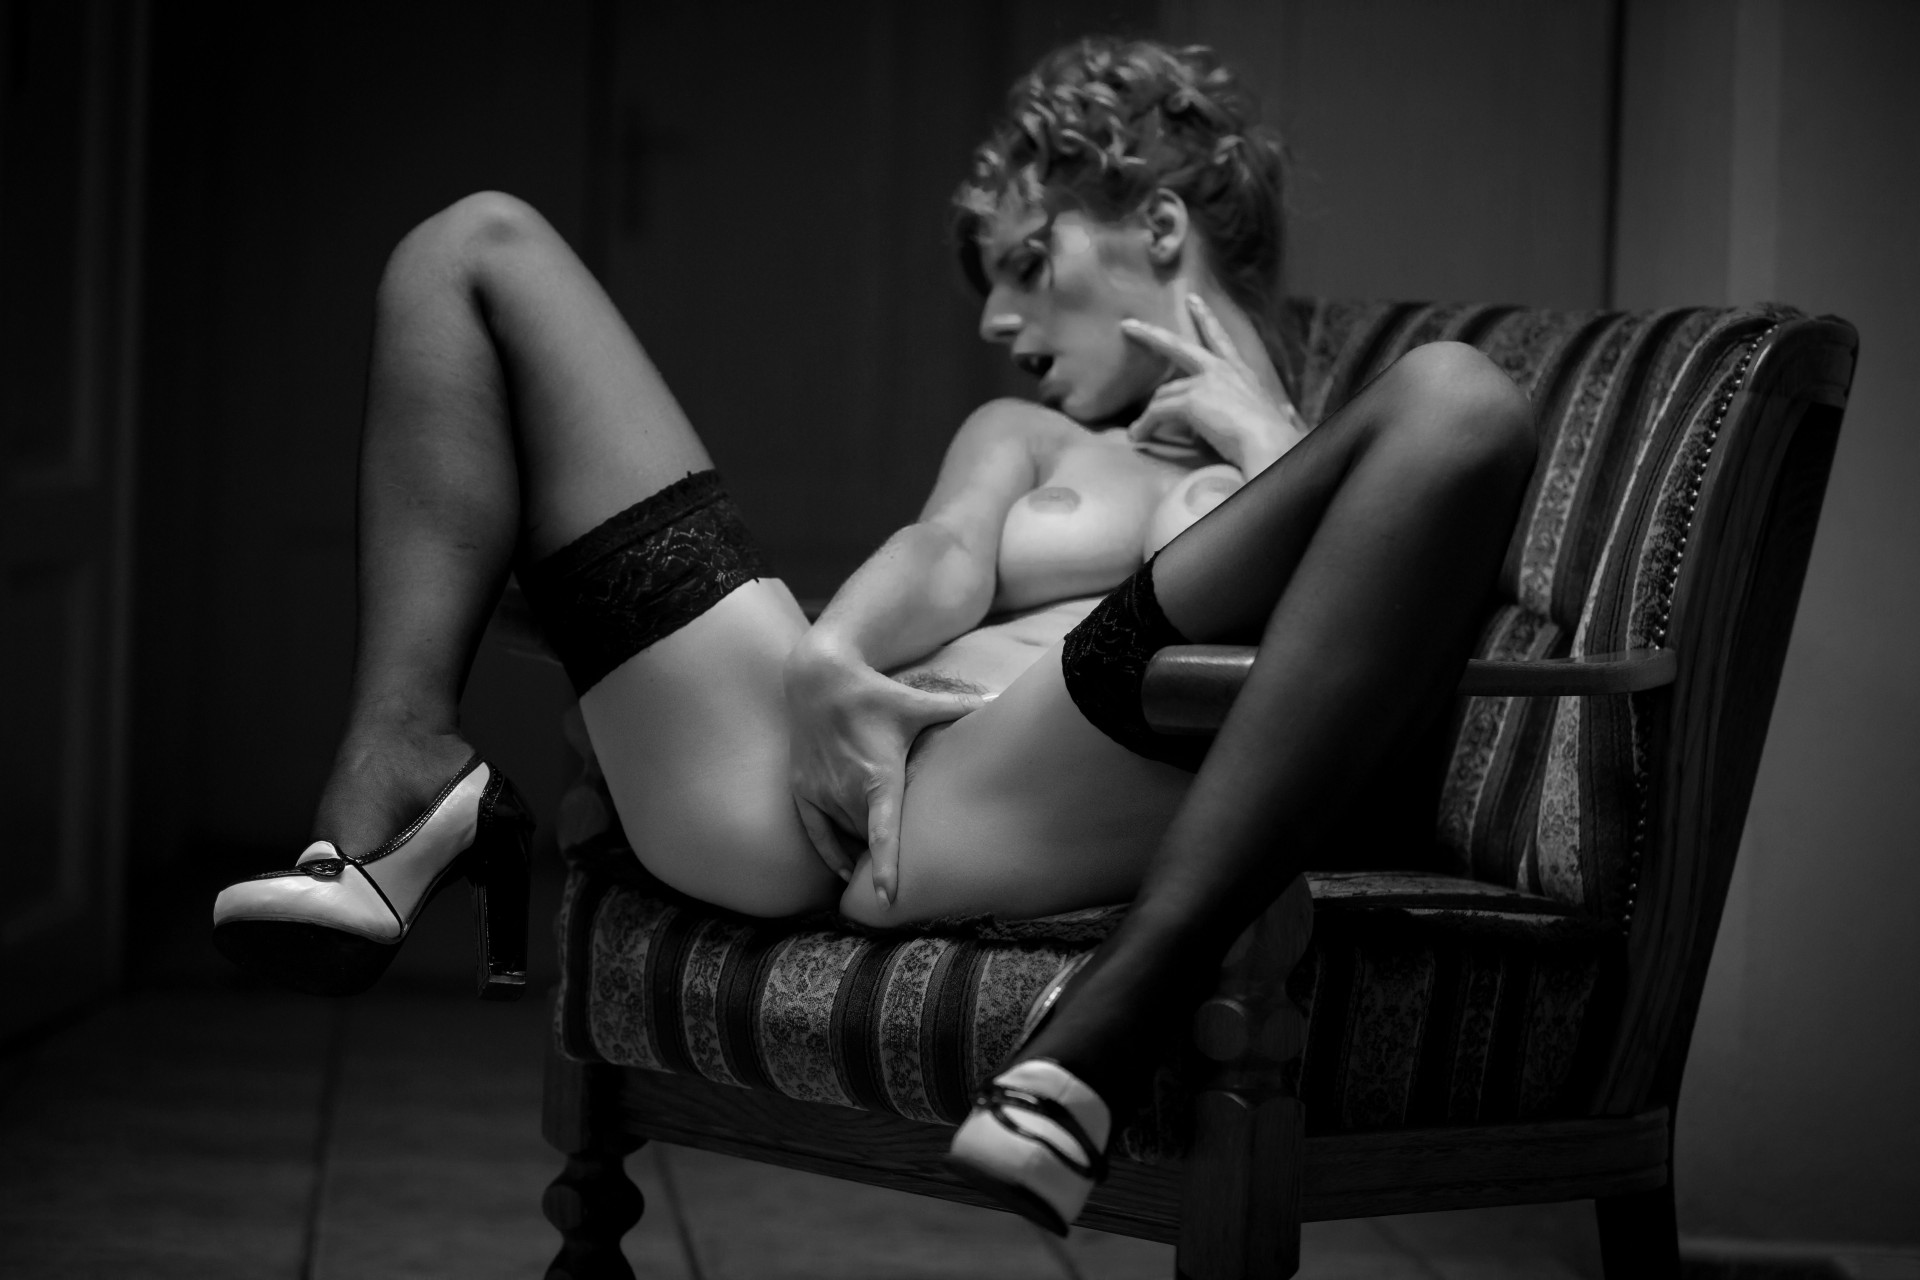 красотки обожают, ч б эротика на грани кто